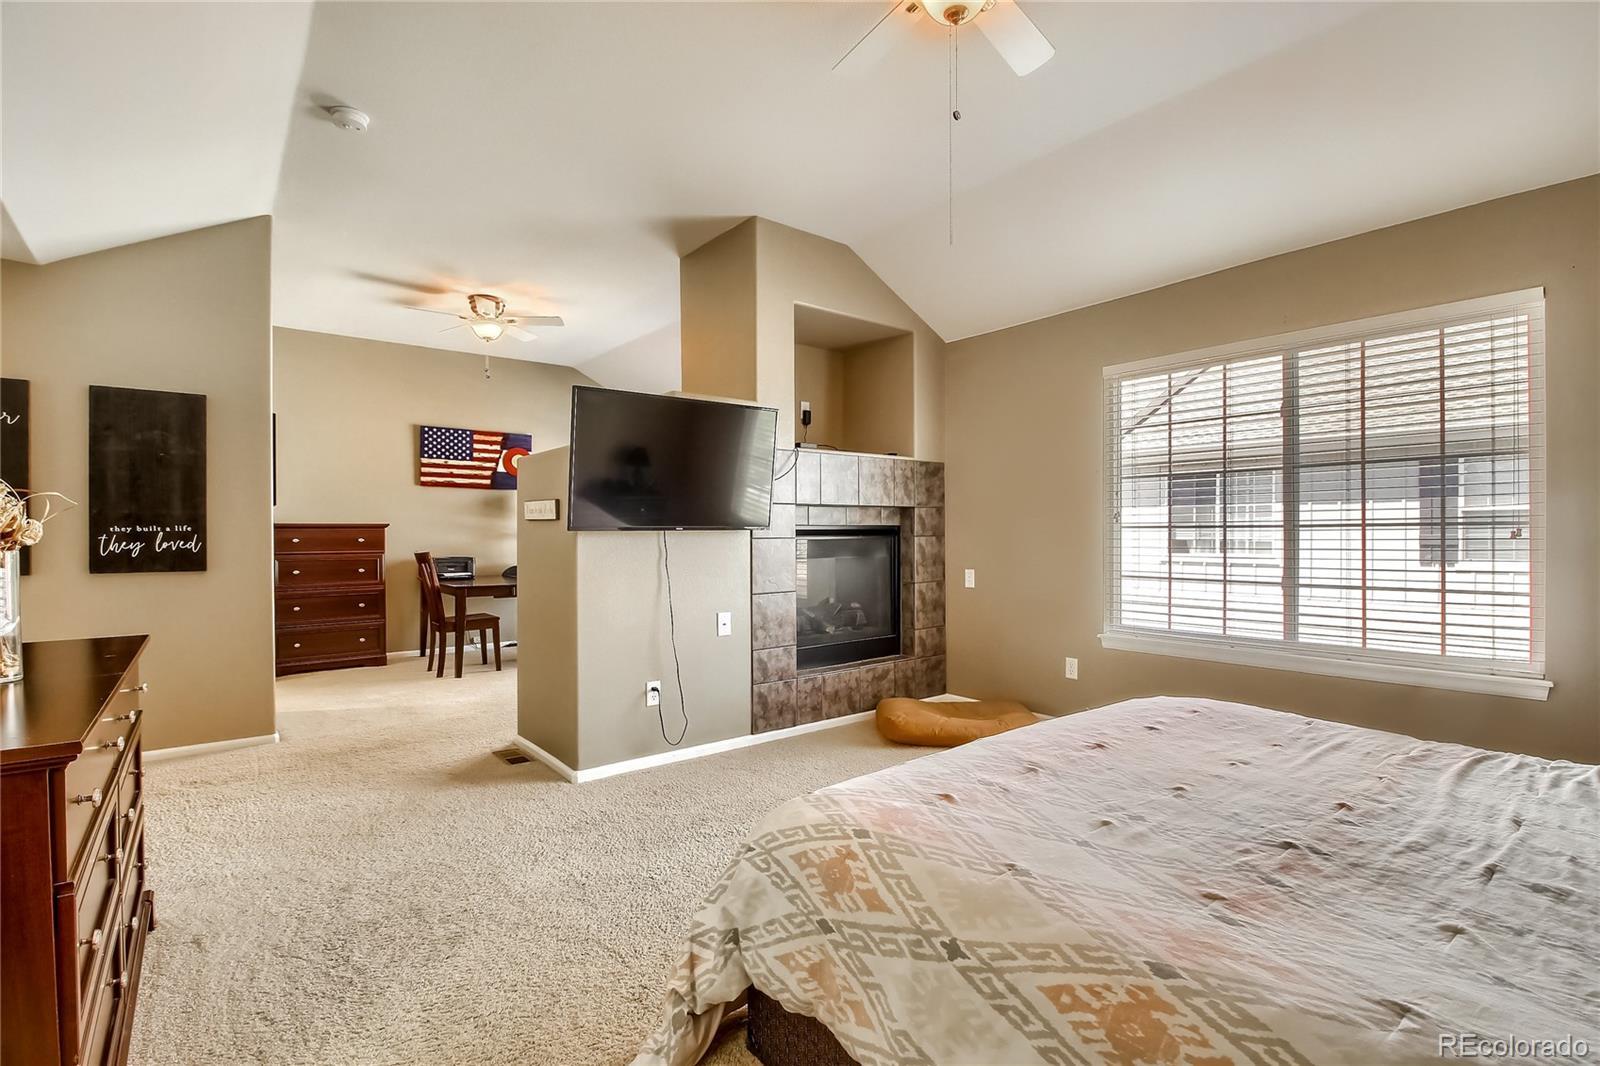 MLS# 3431573 - 20 - 7337 Norfolk Place, Castle Pines, CO 80108